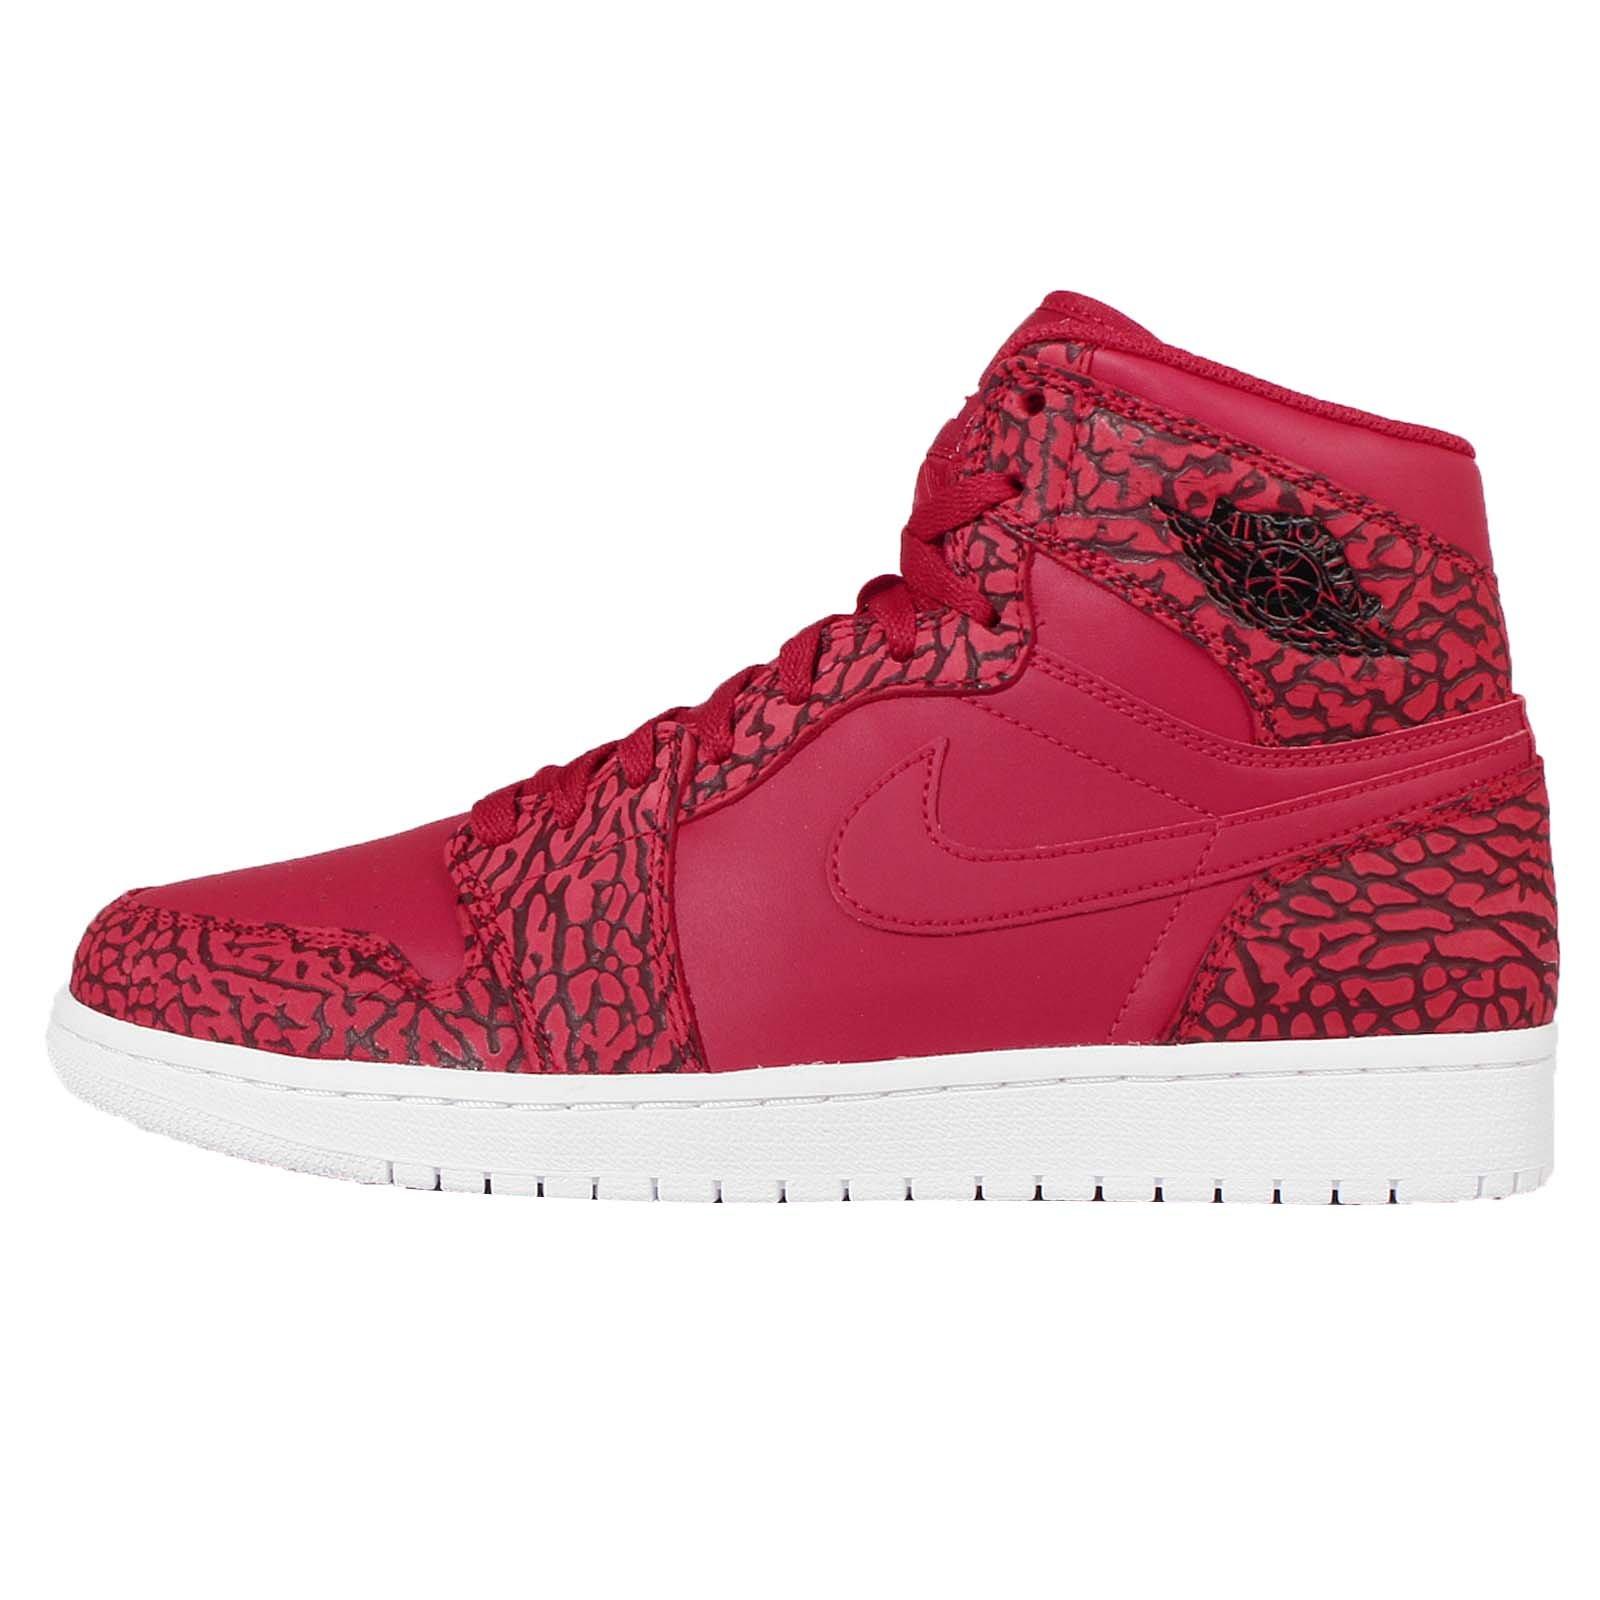 Jordan Nike Men's Air 1 Retro High Basketball Shoe